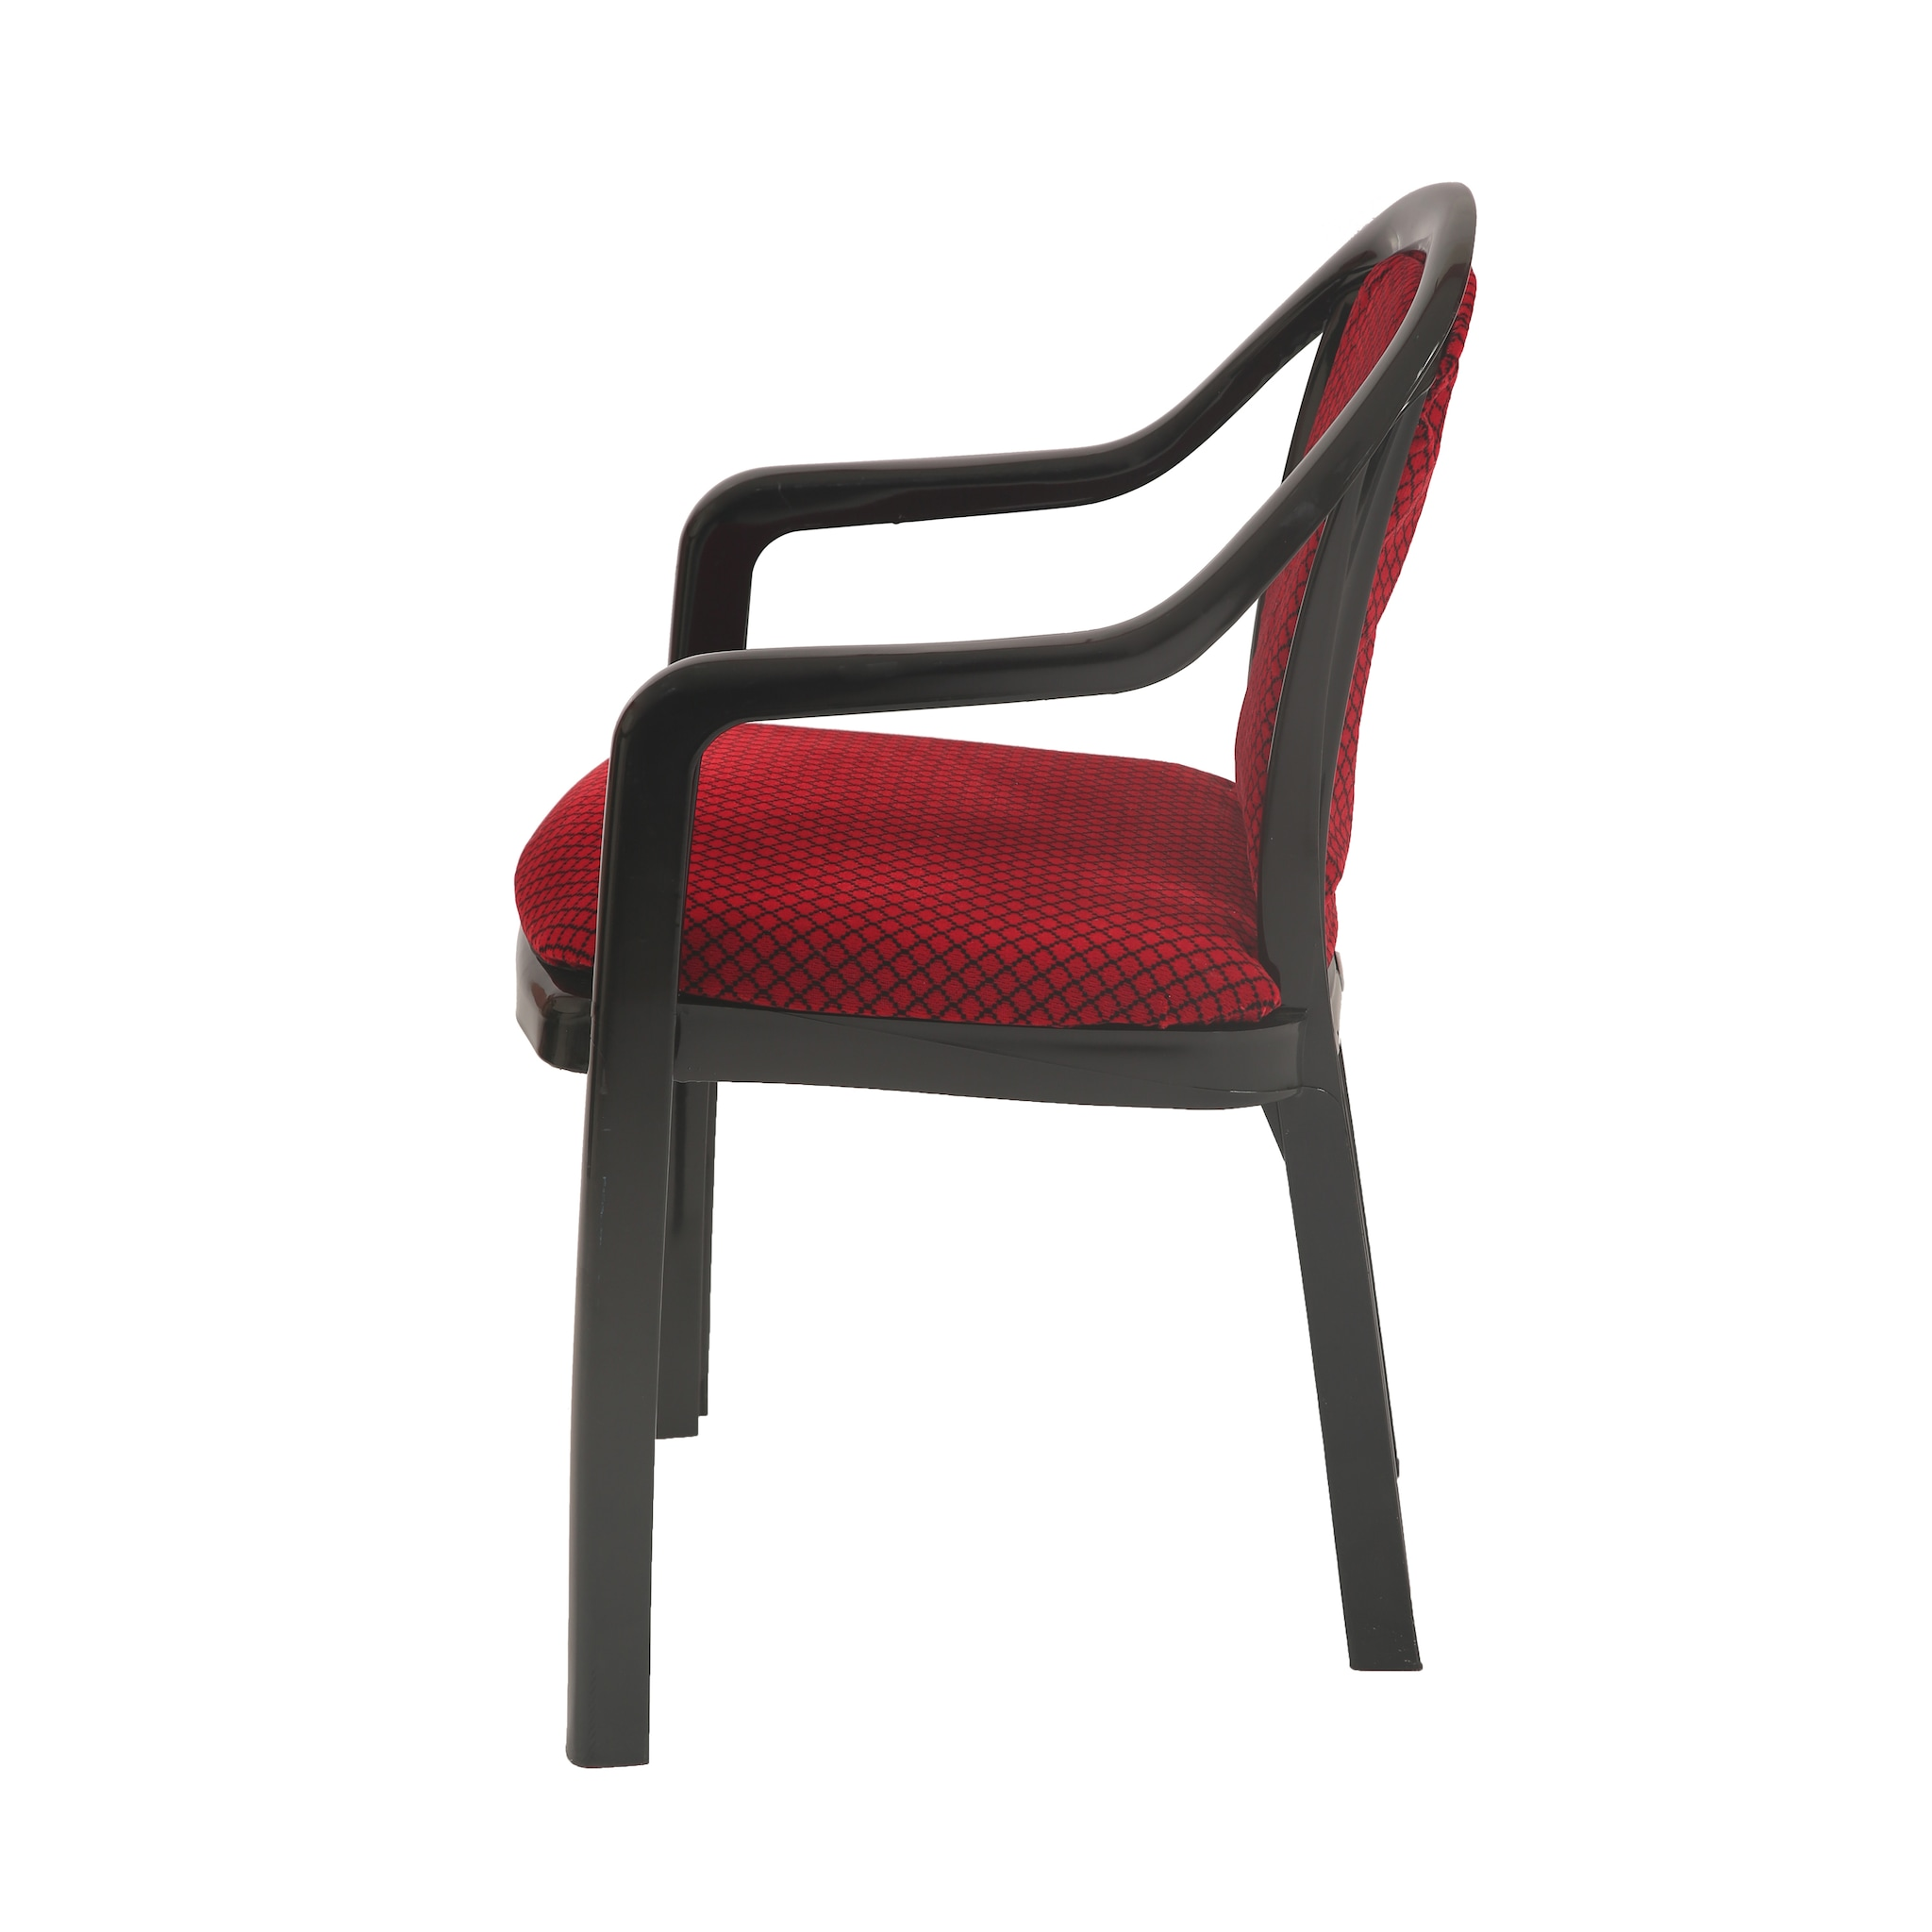 Ornate (Black-Red)